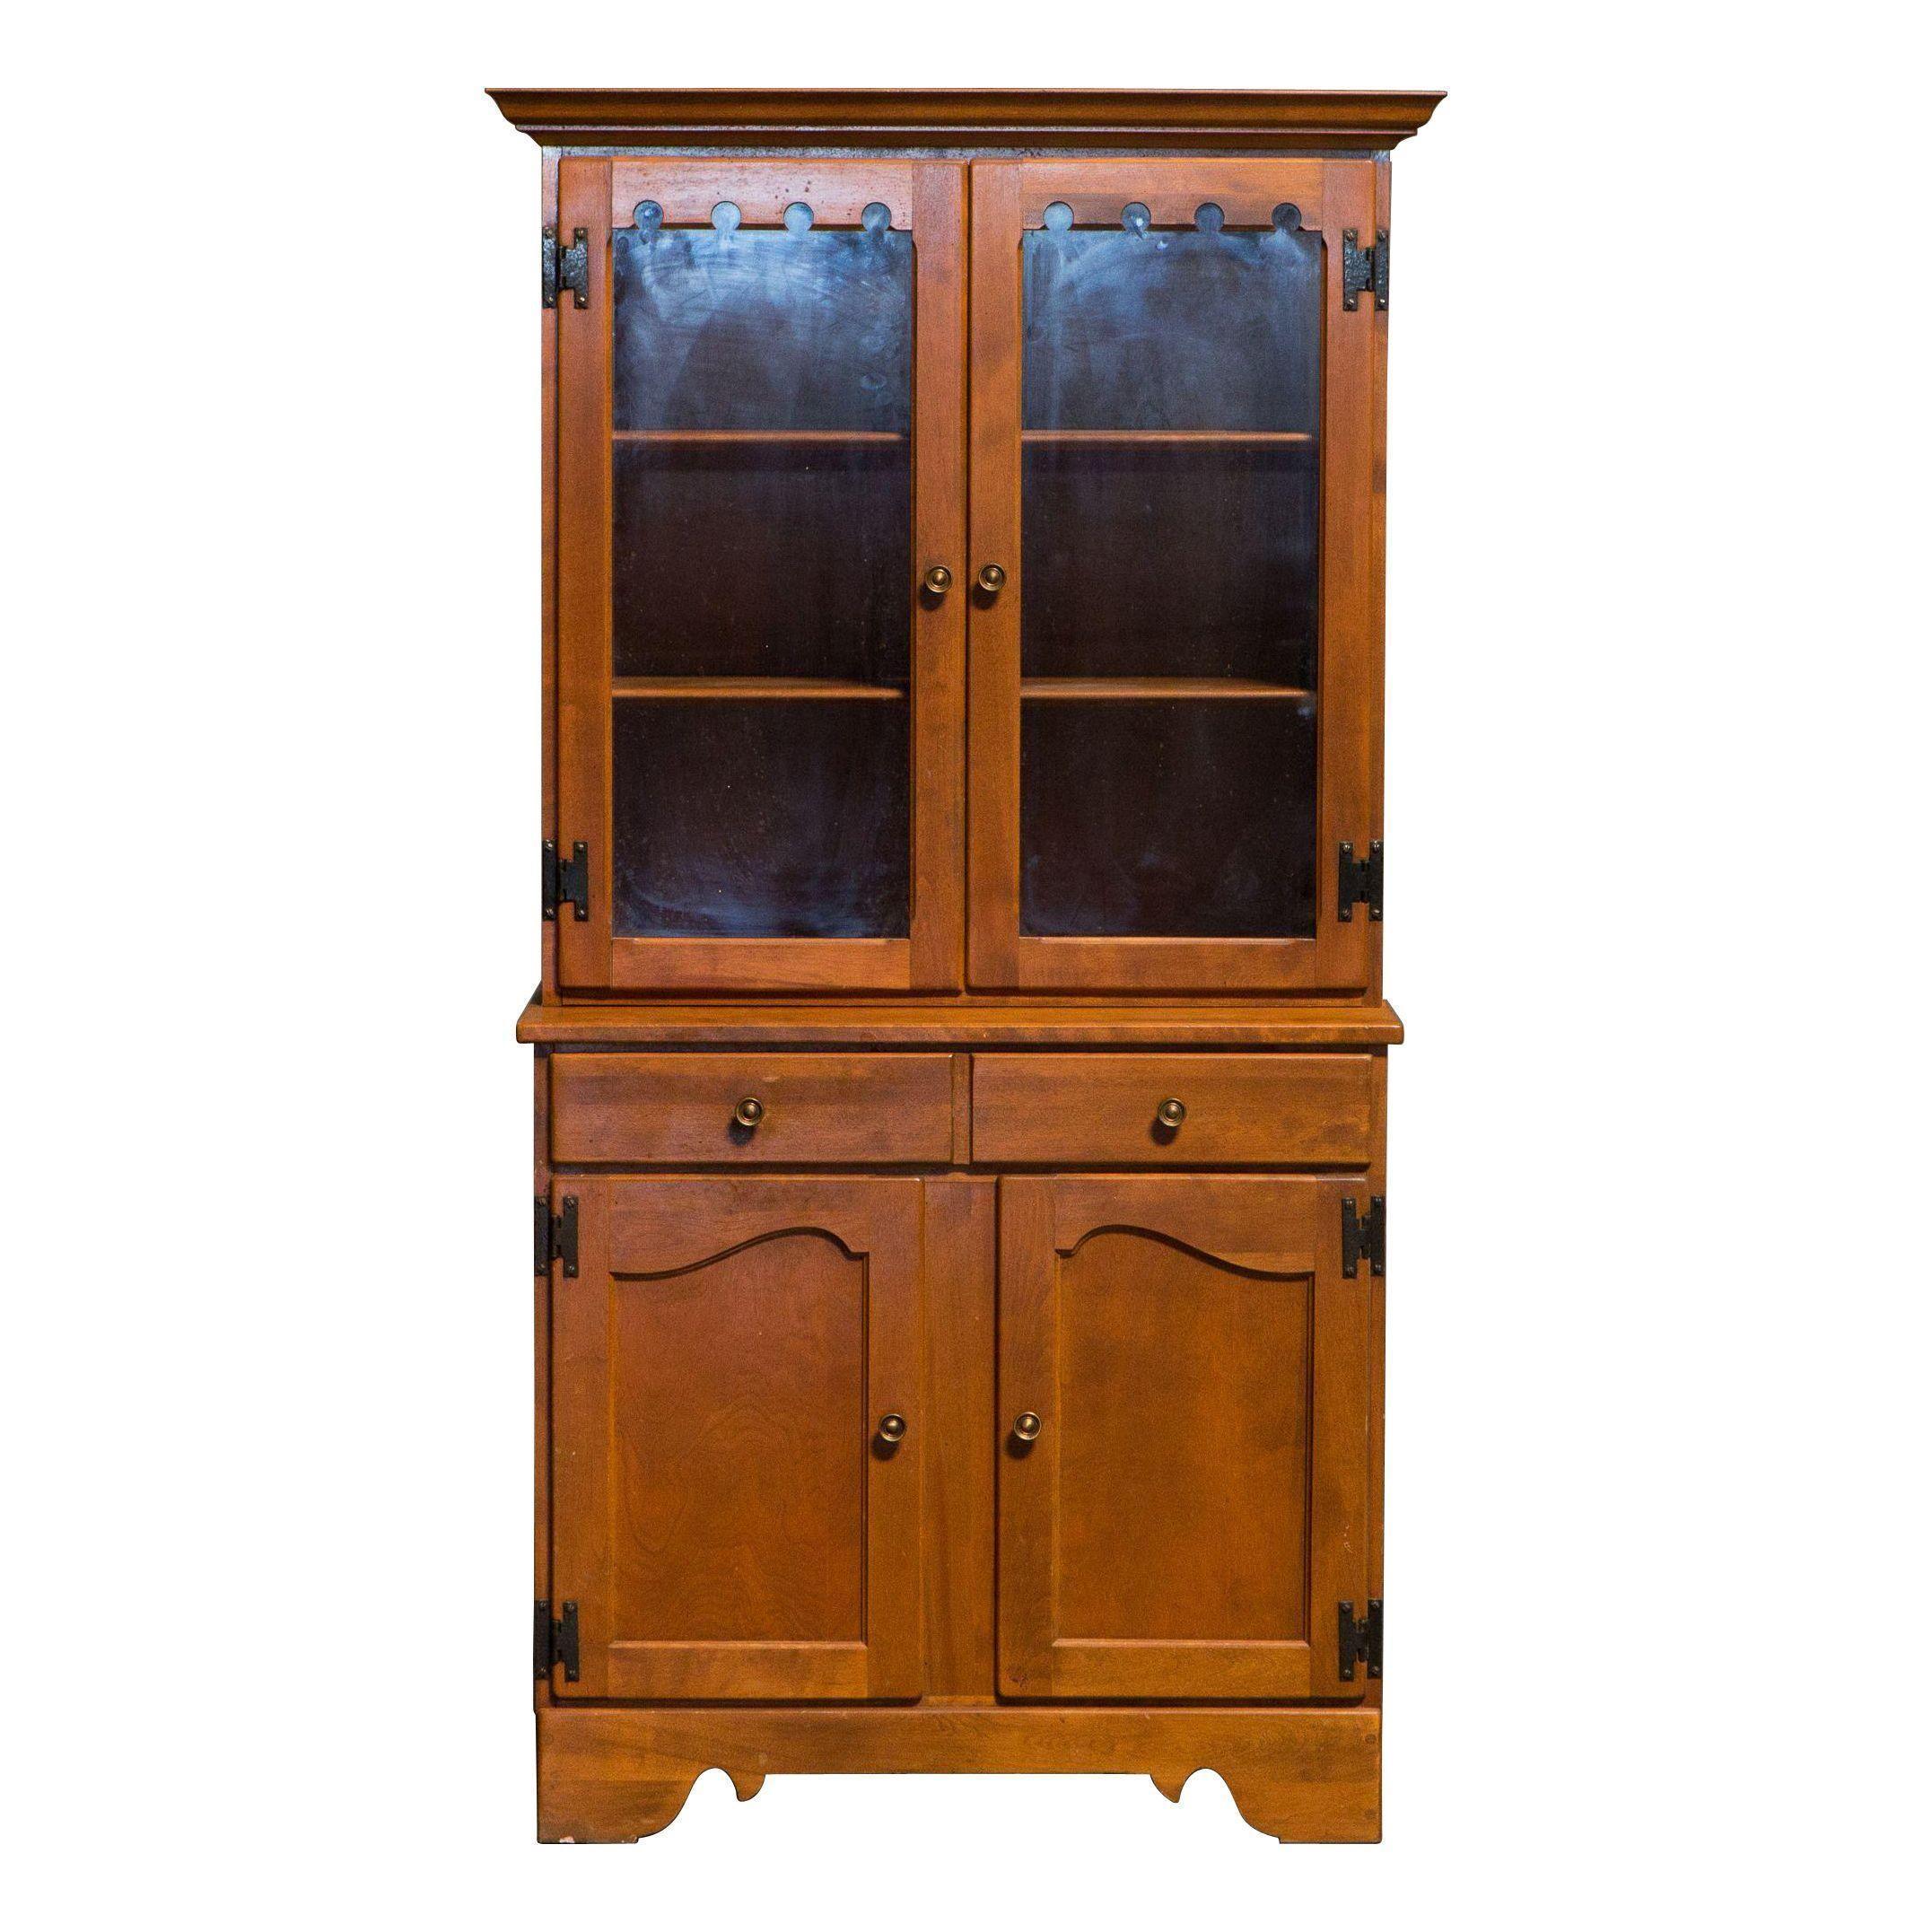 Vintage Ethan Allen China Cabinet / Display Hutch